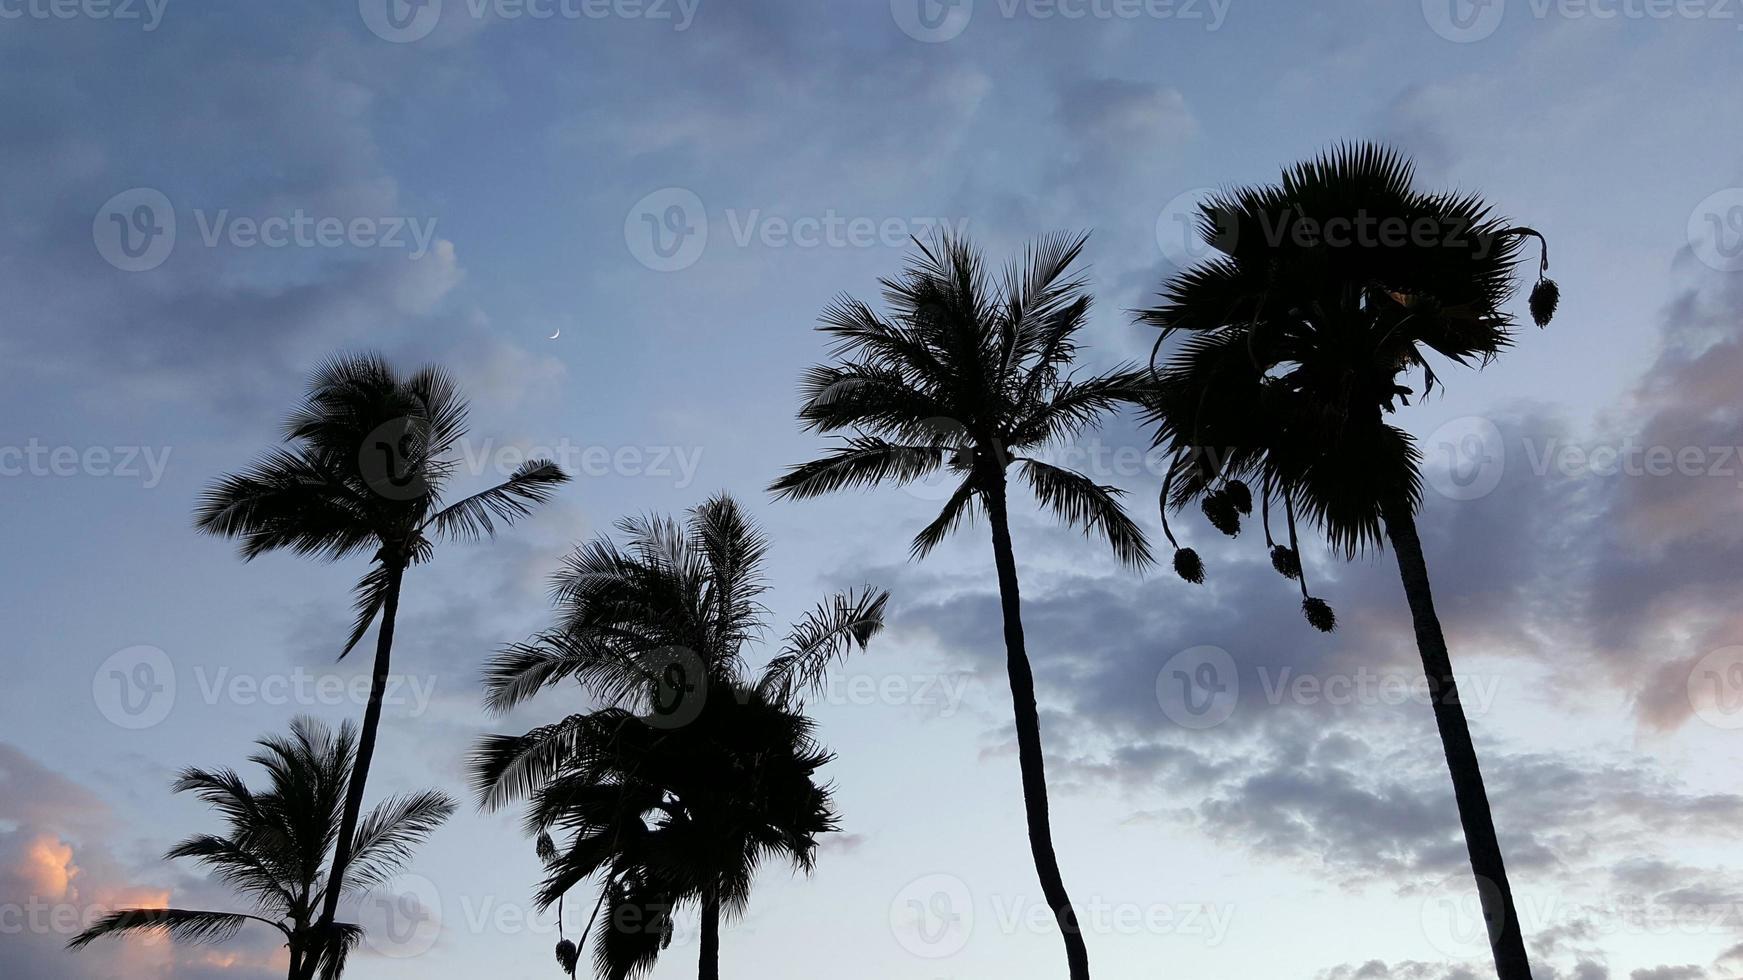 palmbomen in silhouet foto